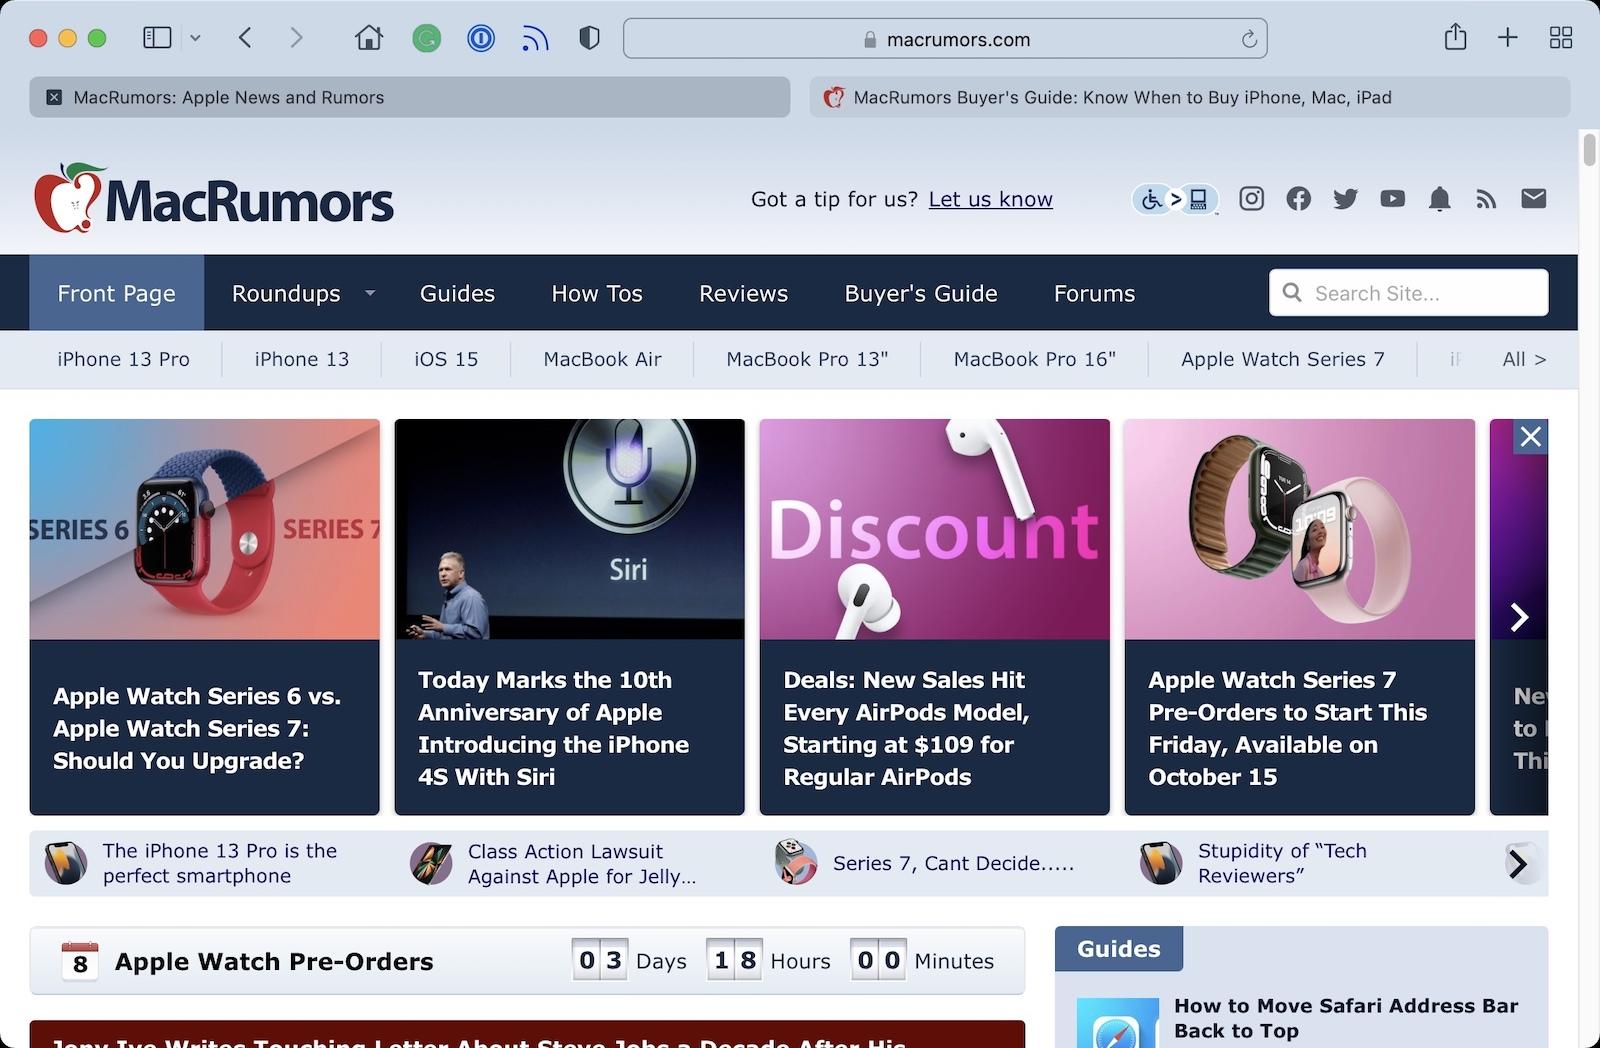 Safari 15 Users Say New Tab Design is Counterintuitive